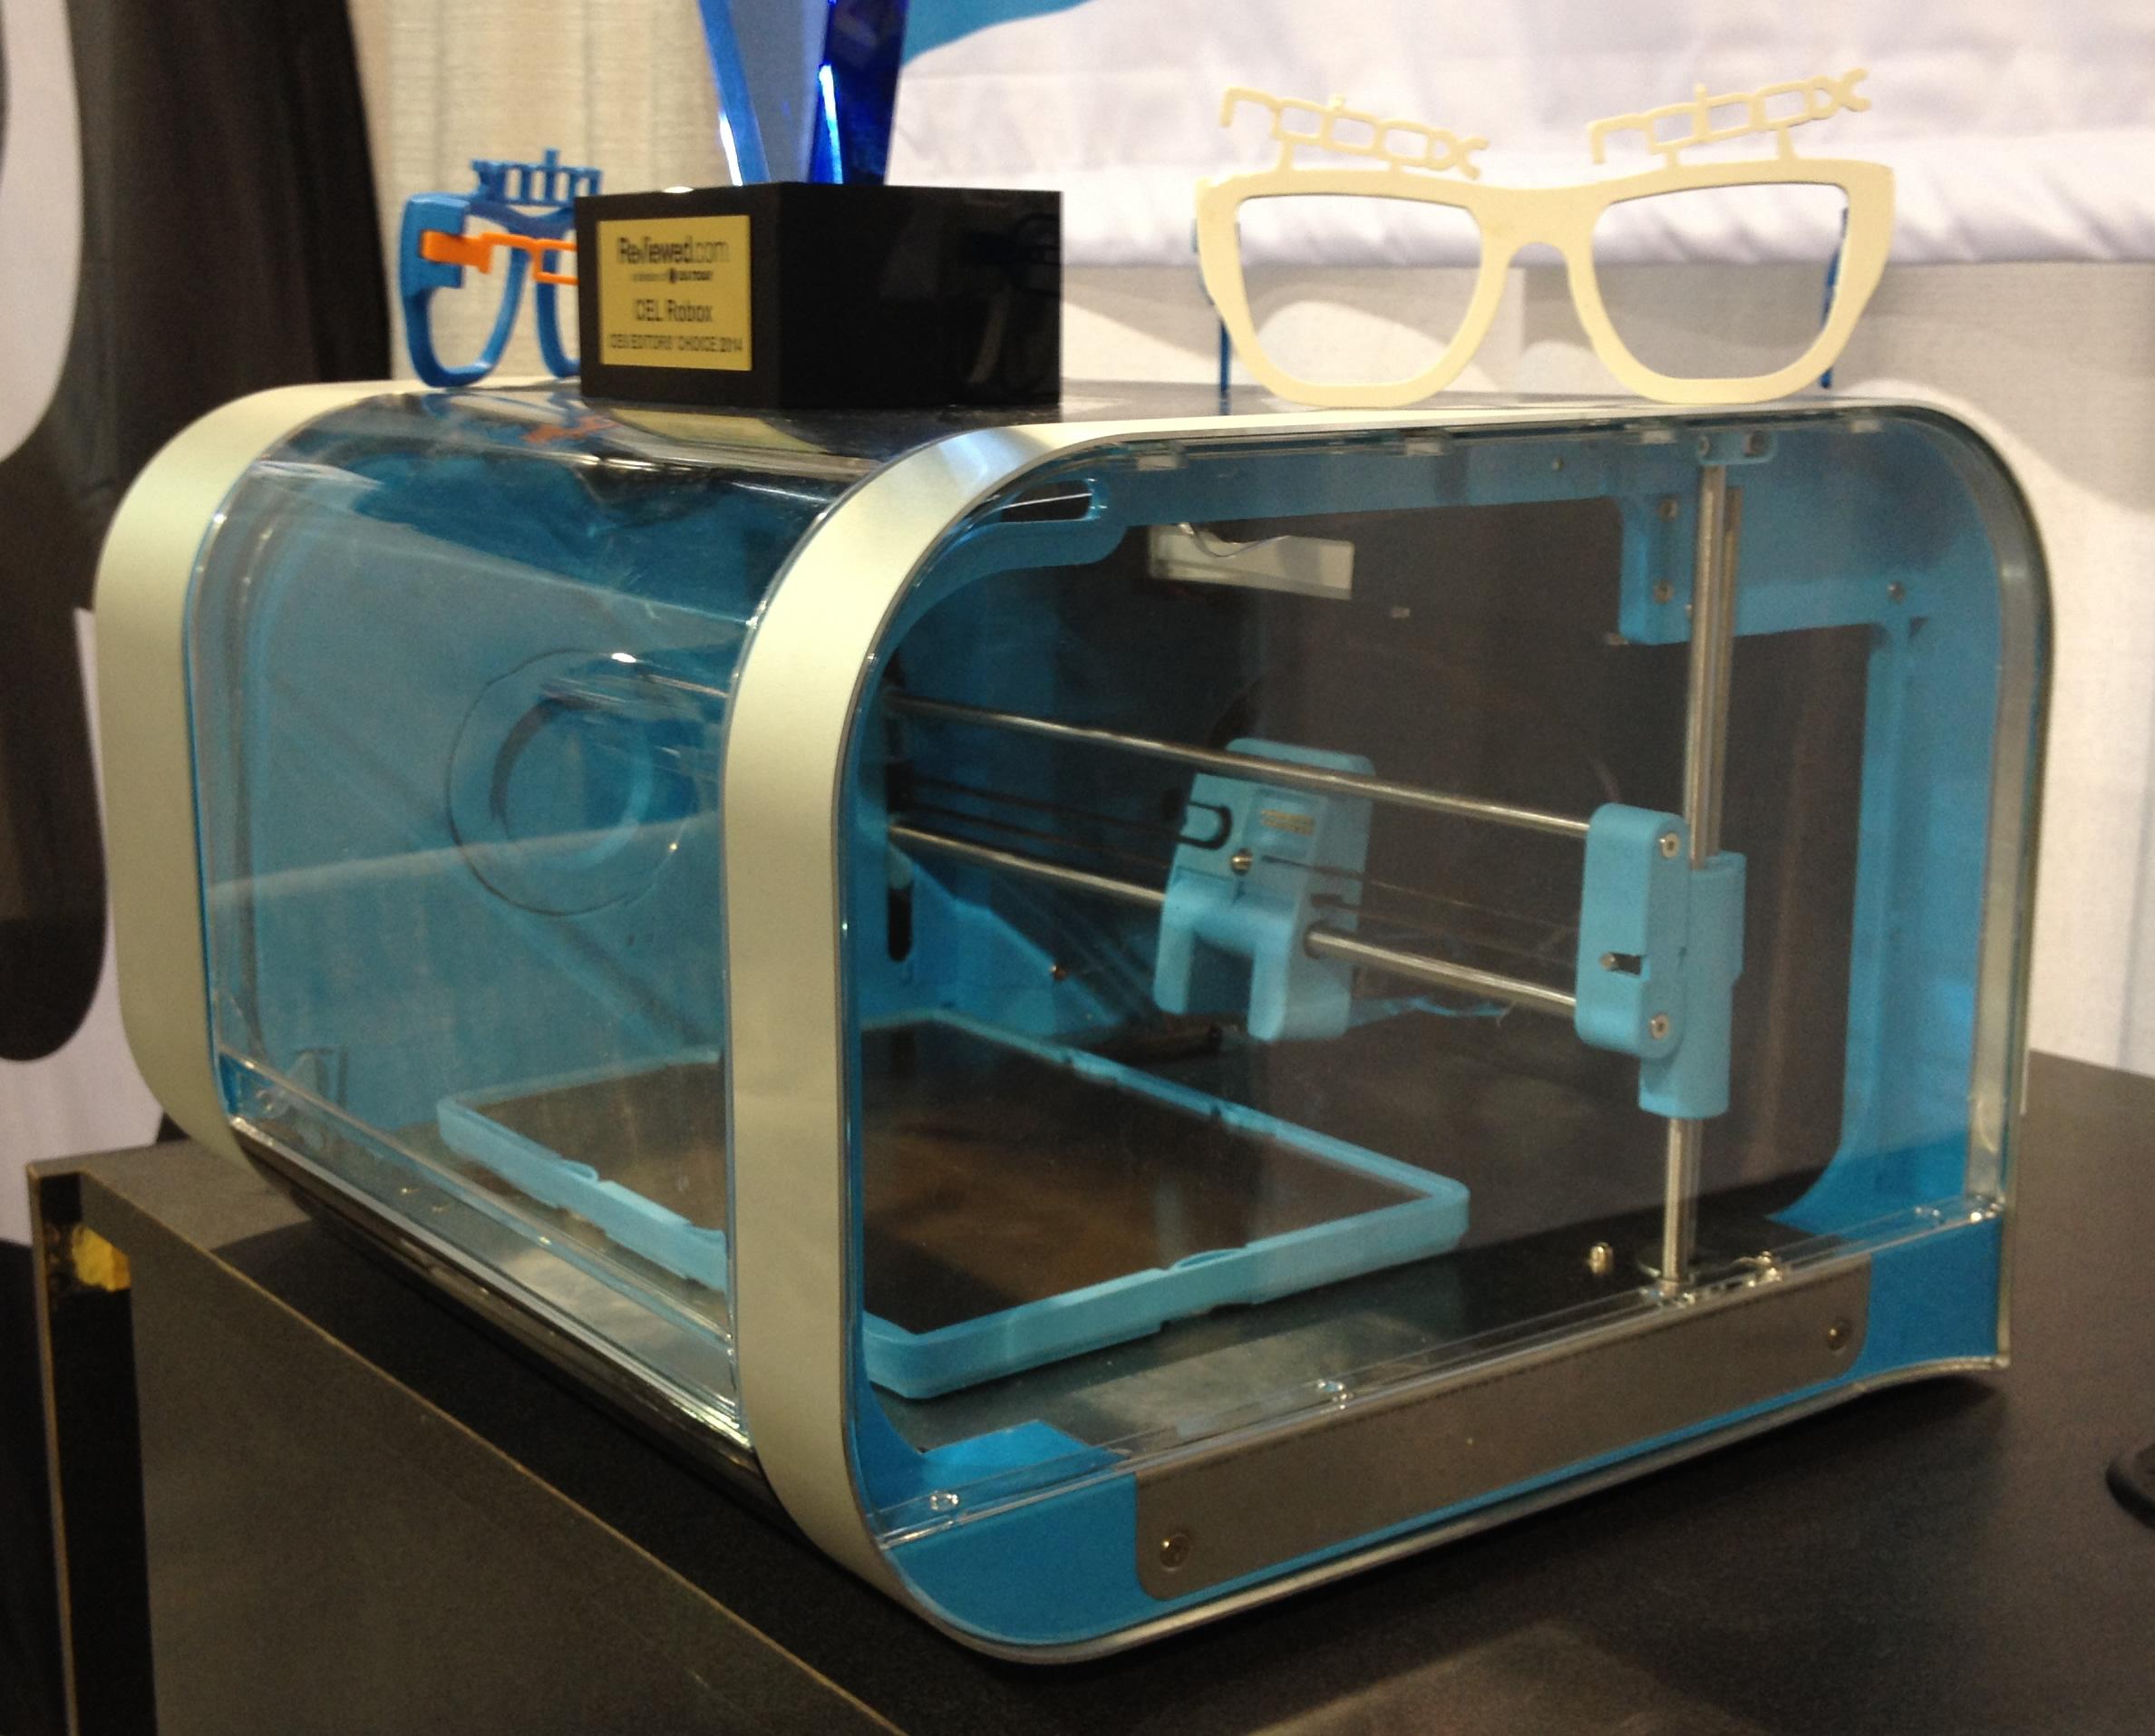 Robox Printer at CES 2014